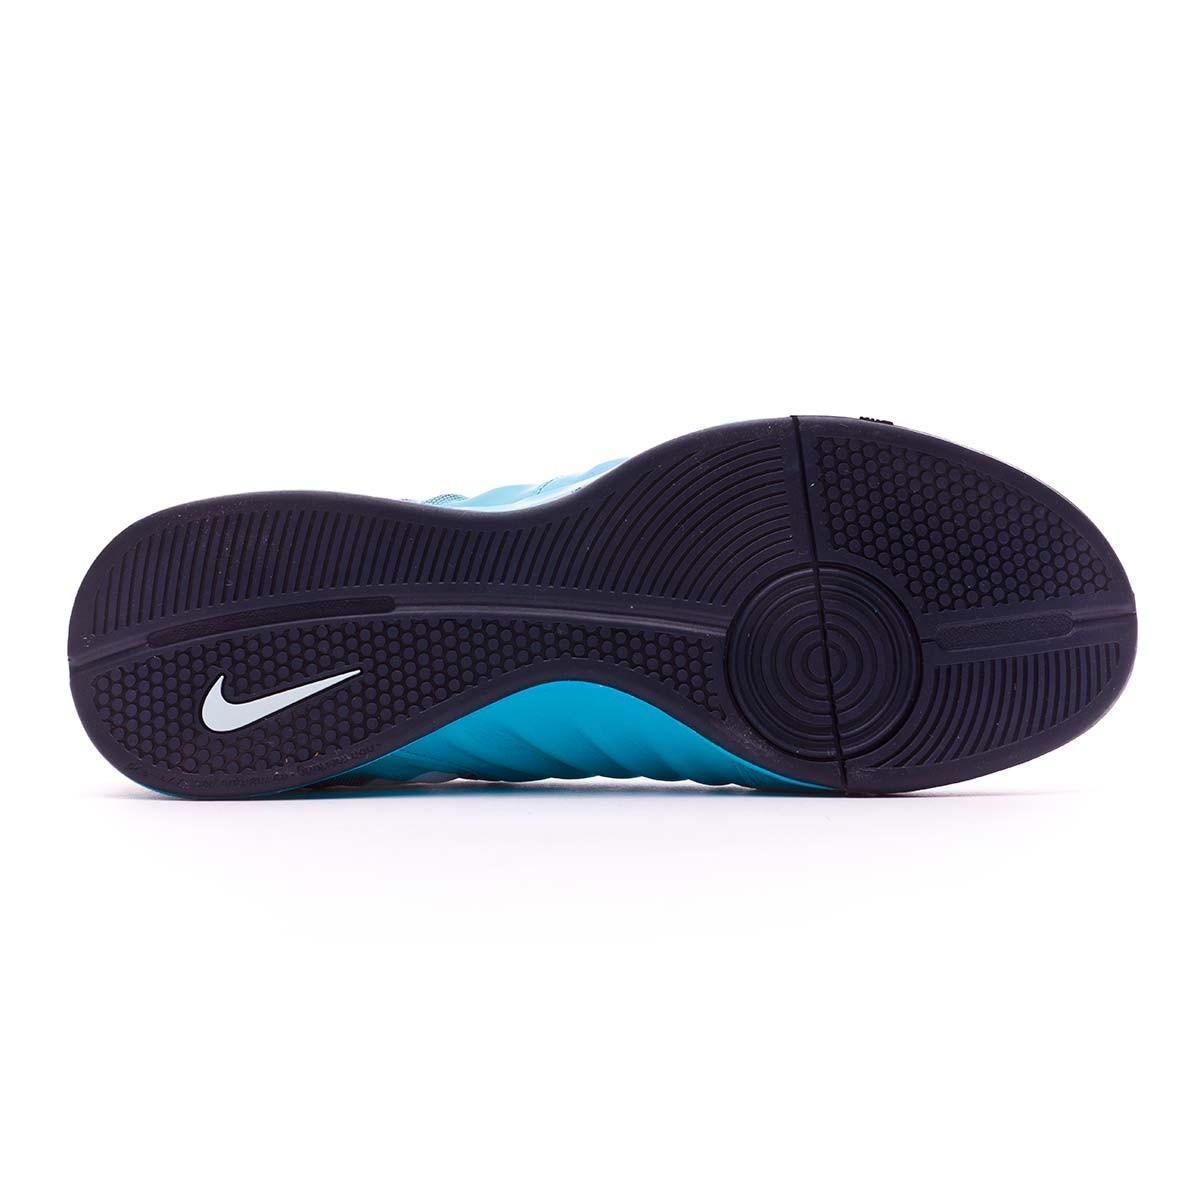 f8aee50c0ea5 Futsal Boot Nike TiempoX Ligera IV IC Glacier blue-Gamma blue-Obsidian-White  - Tienda de fútbol Fútbol Emotion